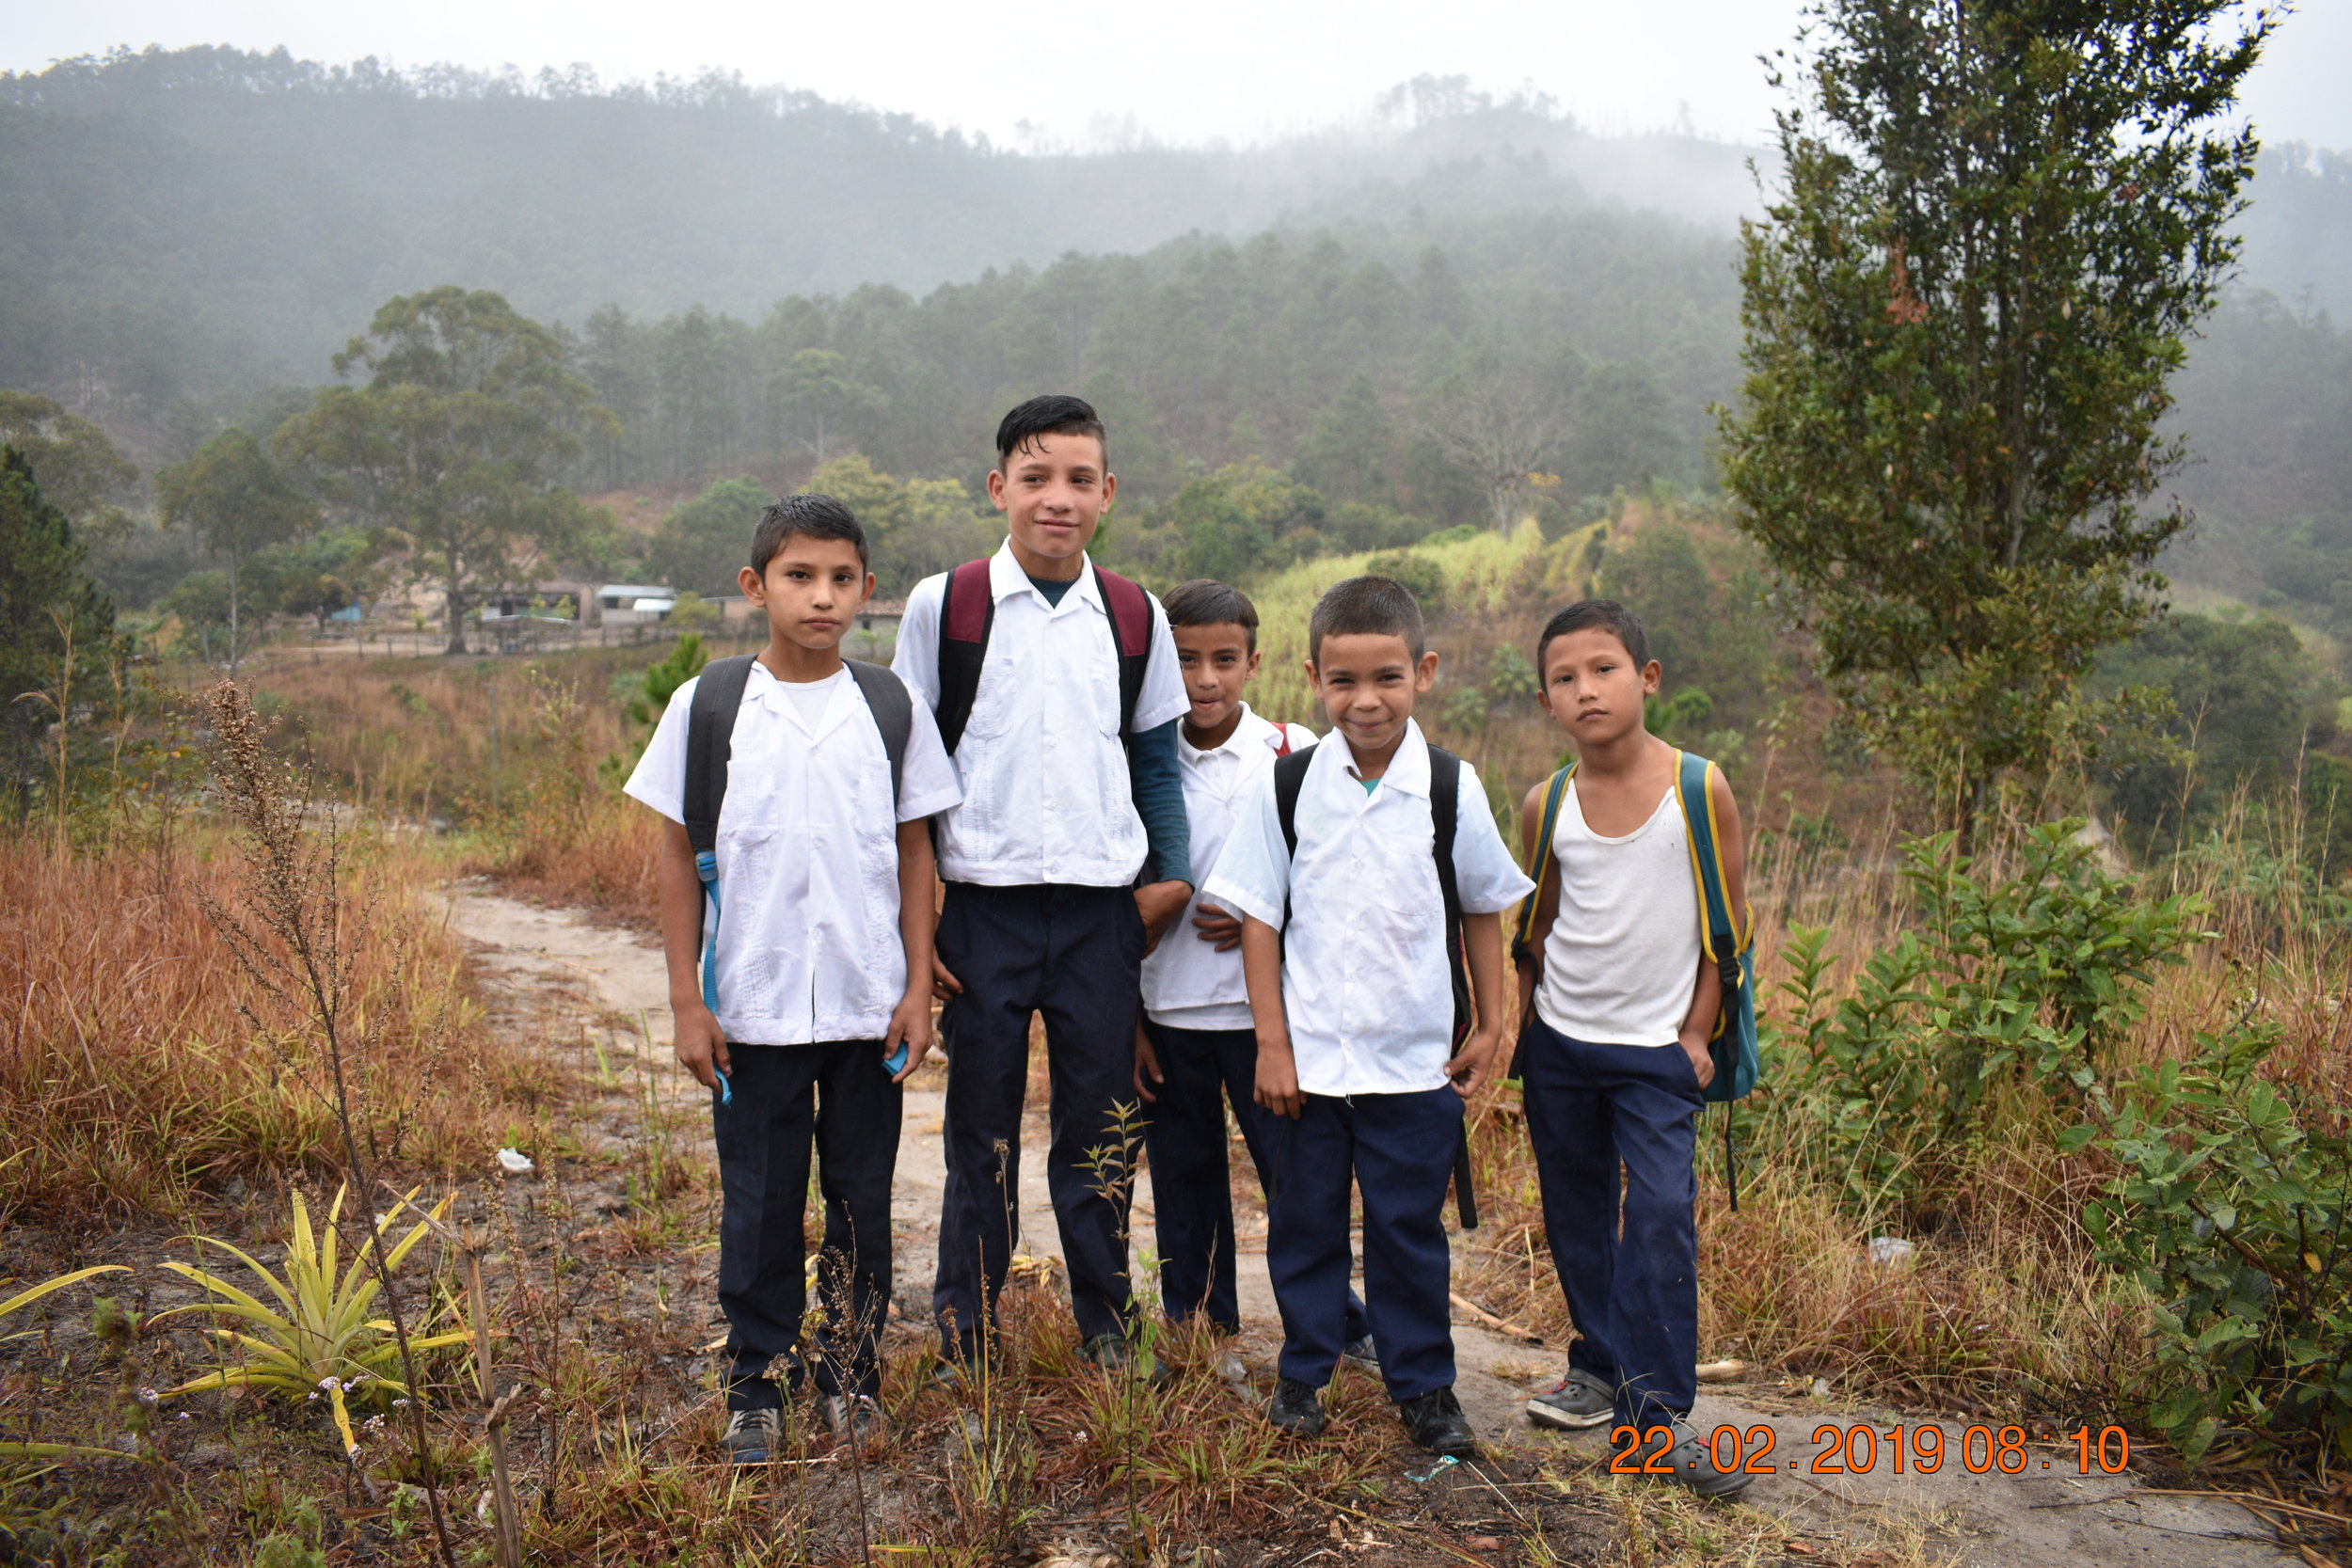 Children majada verde 2.JPG